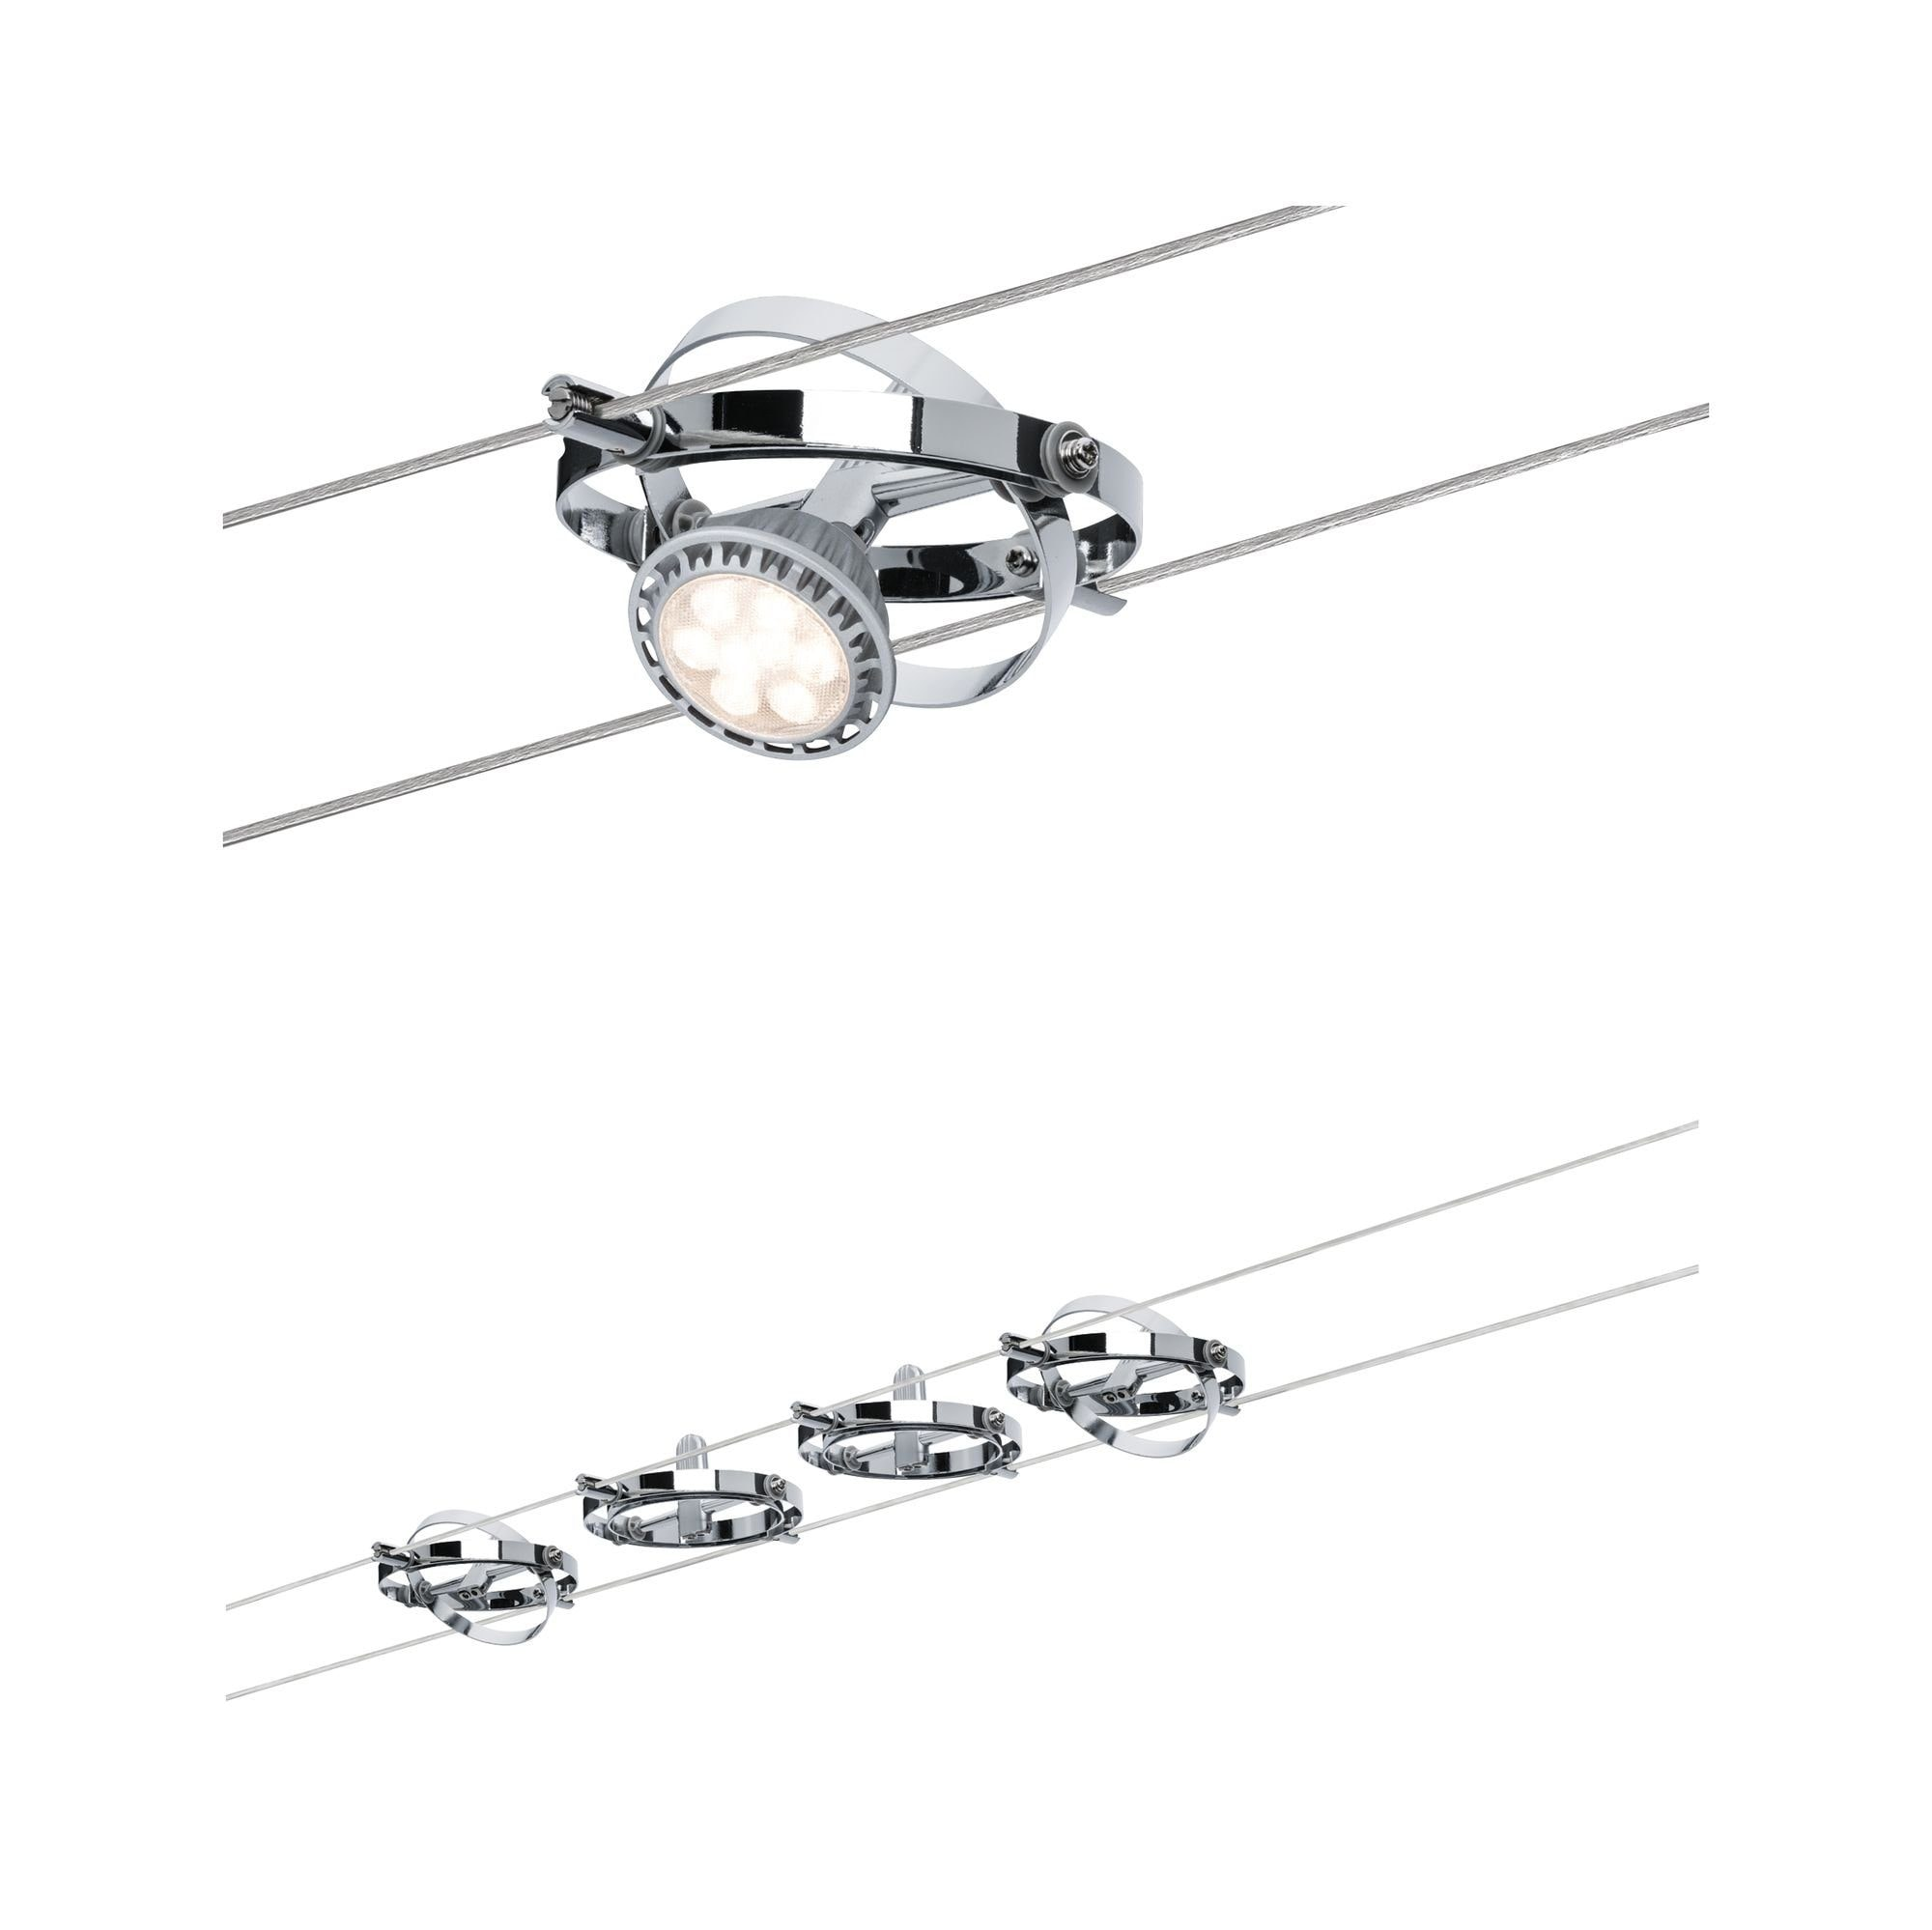 Paulmann,LED Deckenleuchte Seilsystem Cardan Chrom mit 4 Spots max. 10W GU5,3